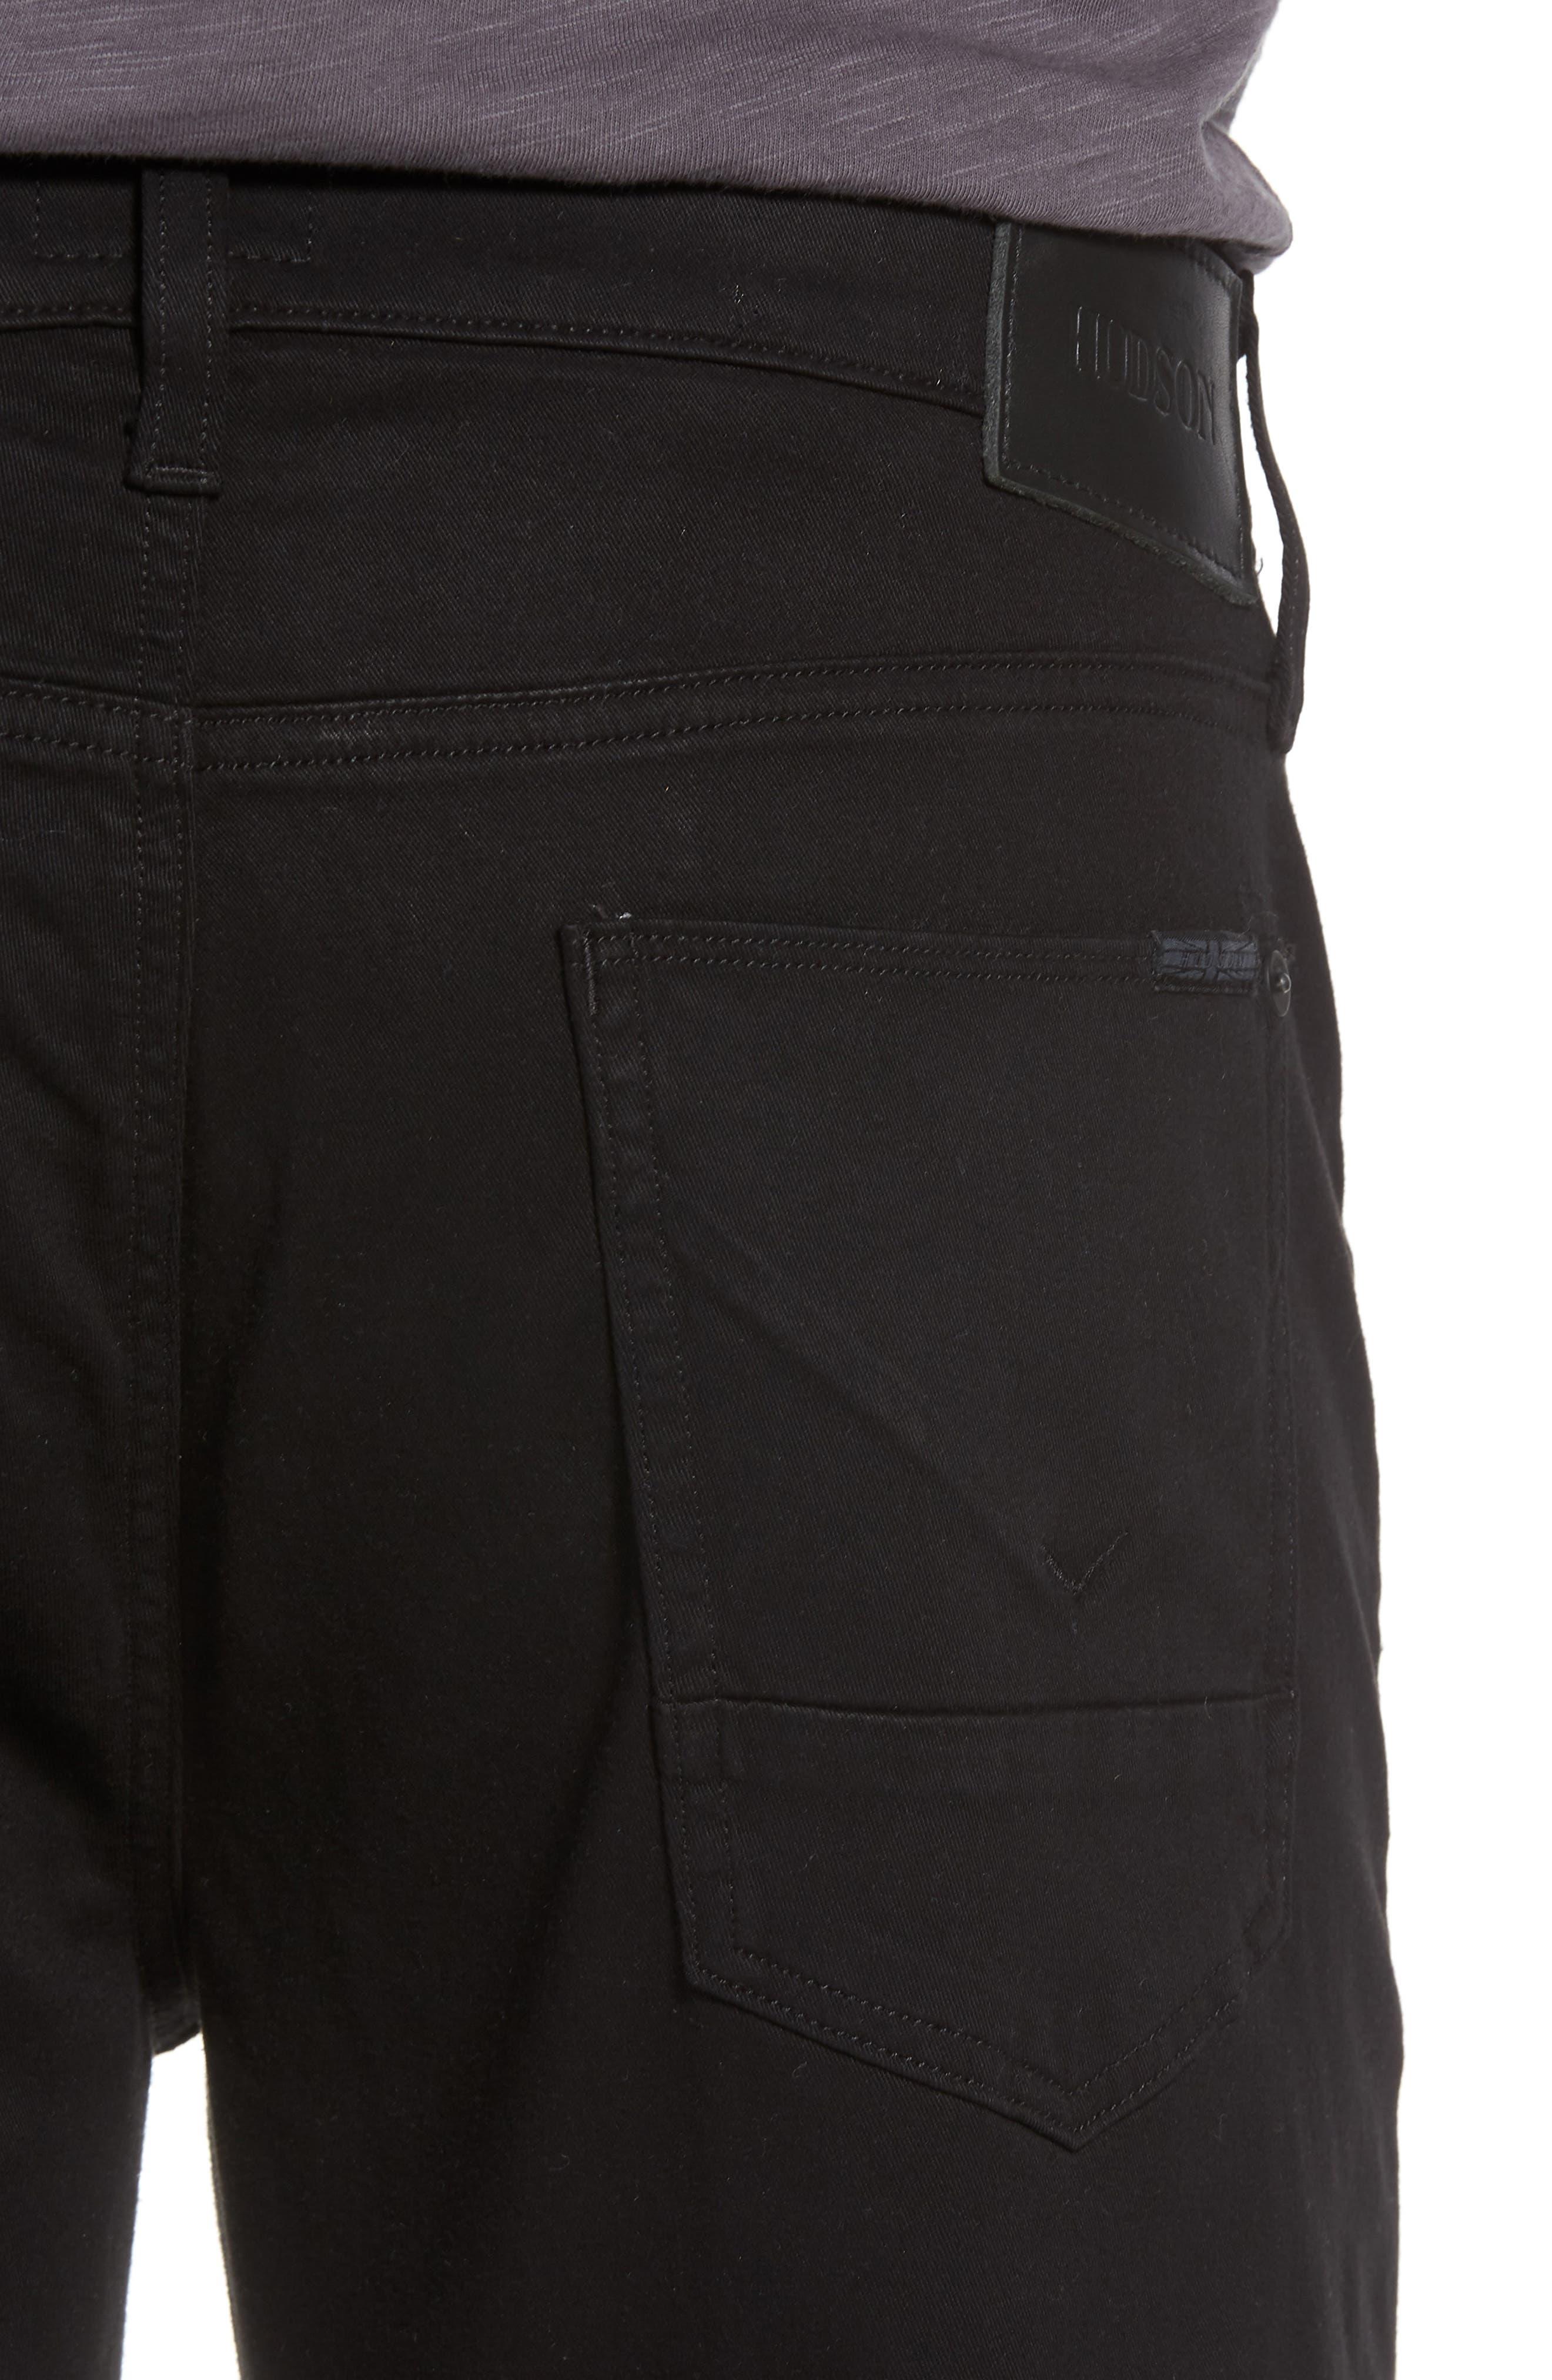 Byron Slim Straight Leg Jeans,                             Alternate thumbnail 4, color,                             Blackened